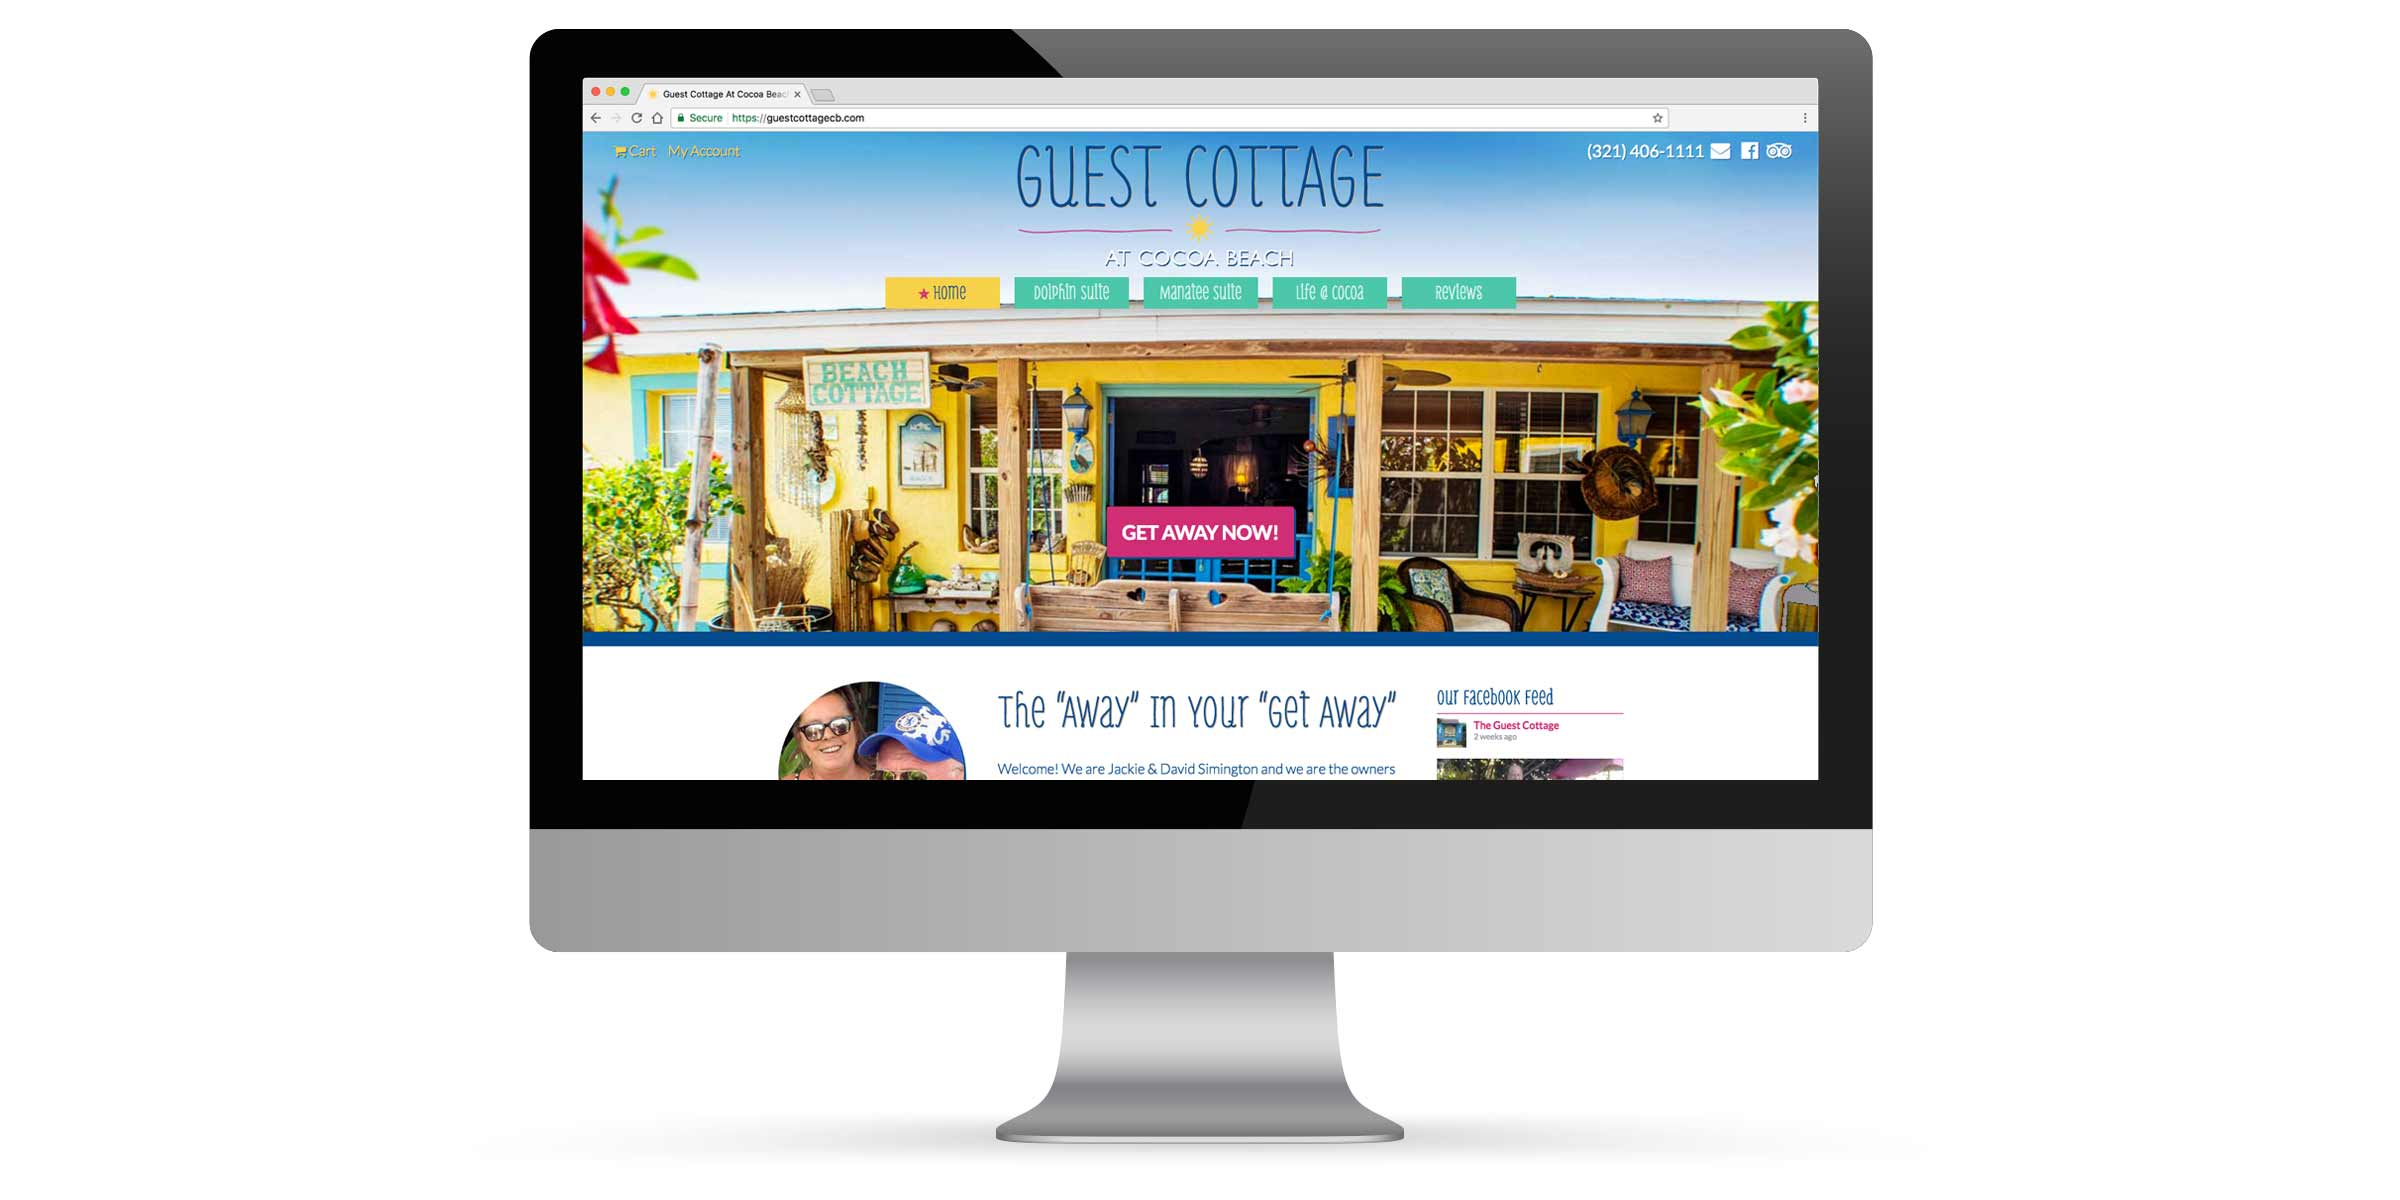 Guest Cottage Cocoa Beach Website Development Portfolio